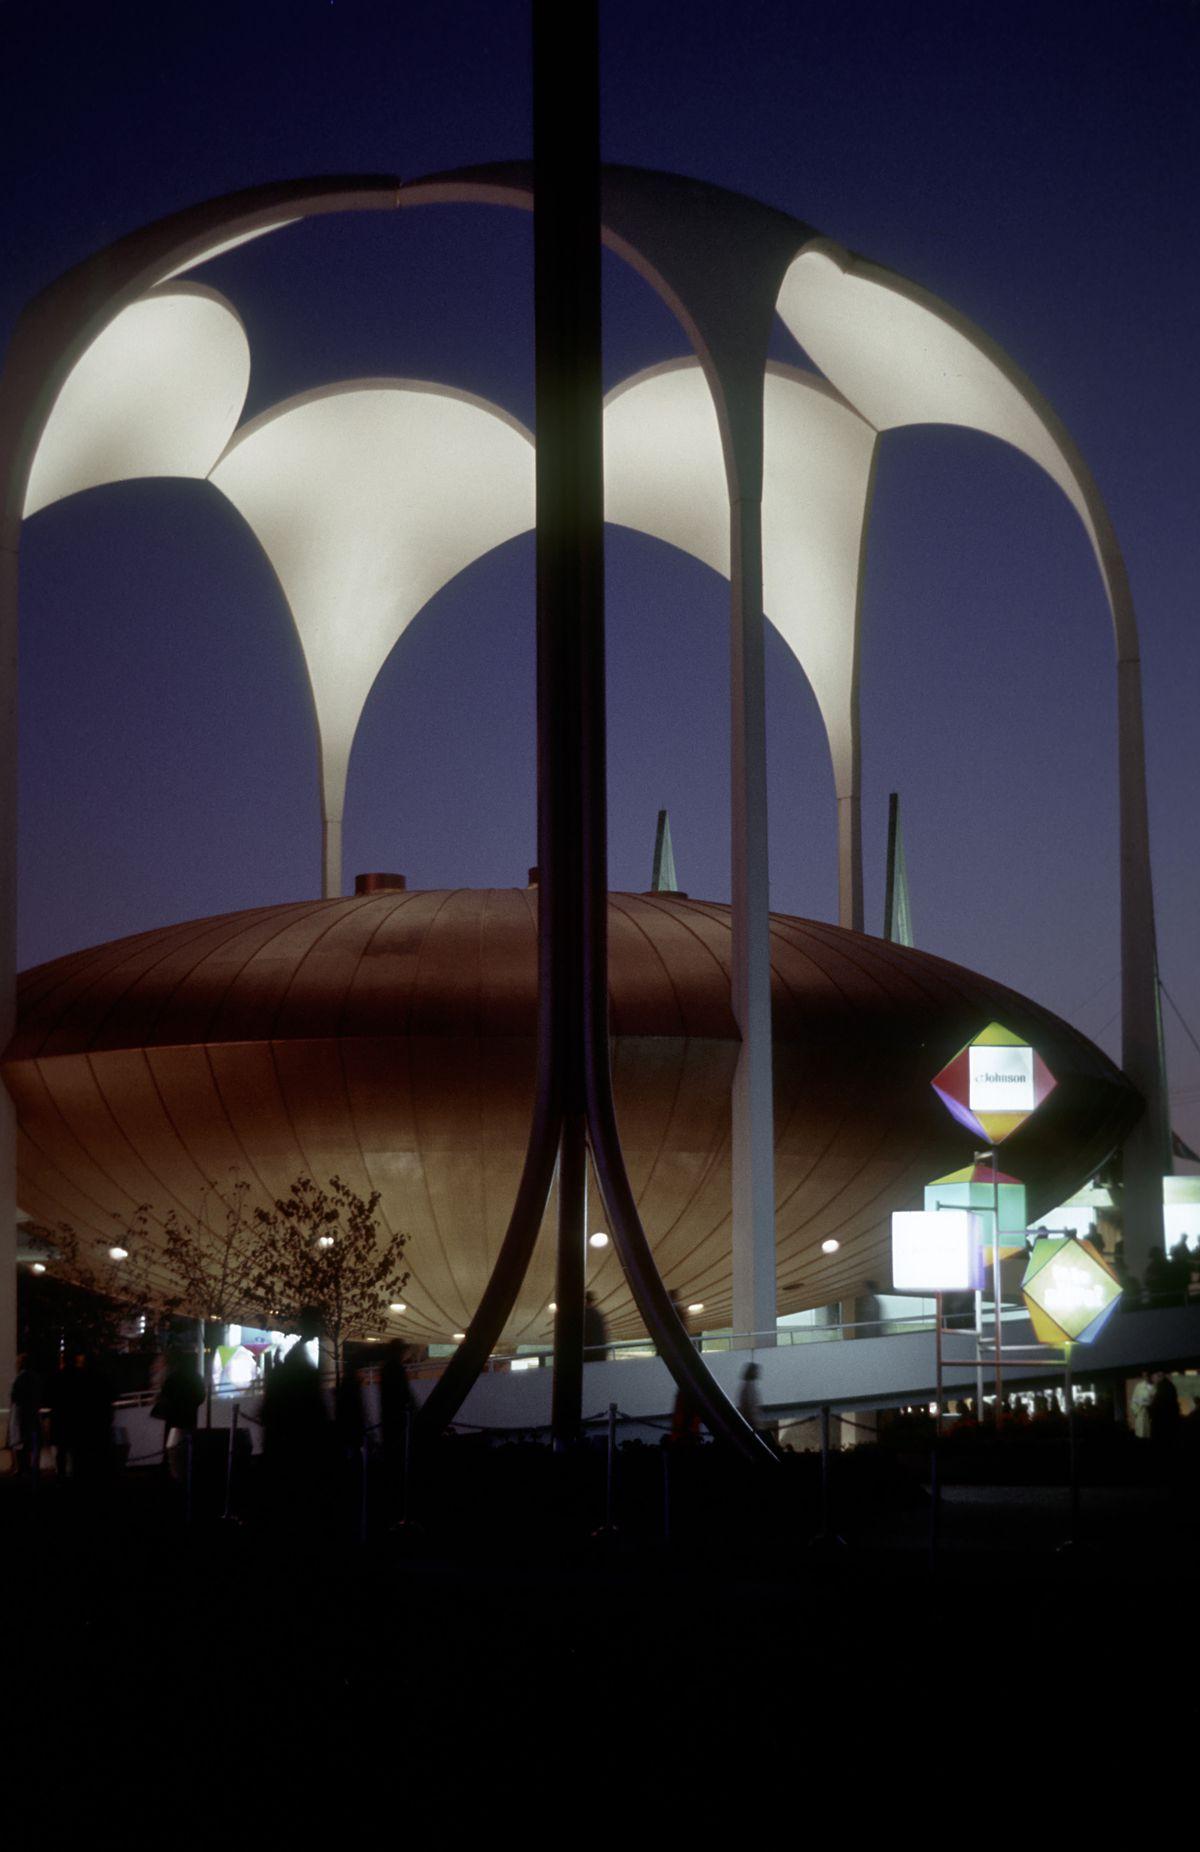 Johnson-Wax Pavilion at night